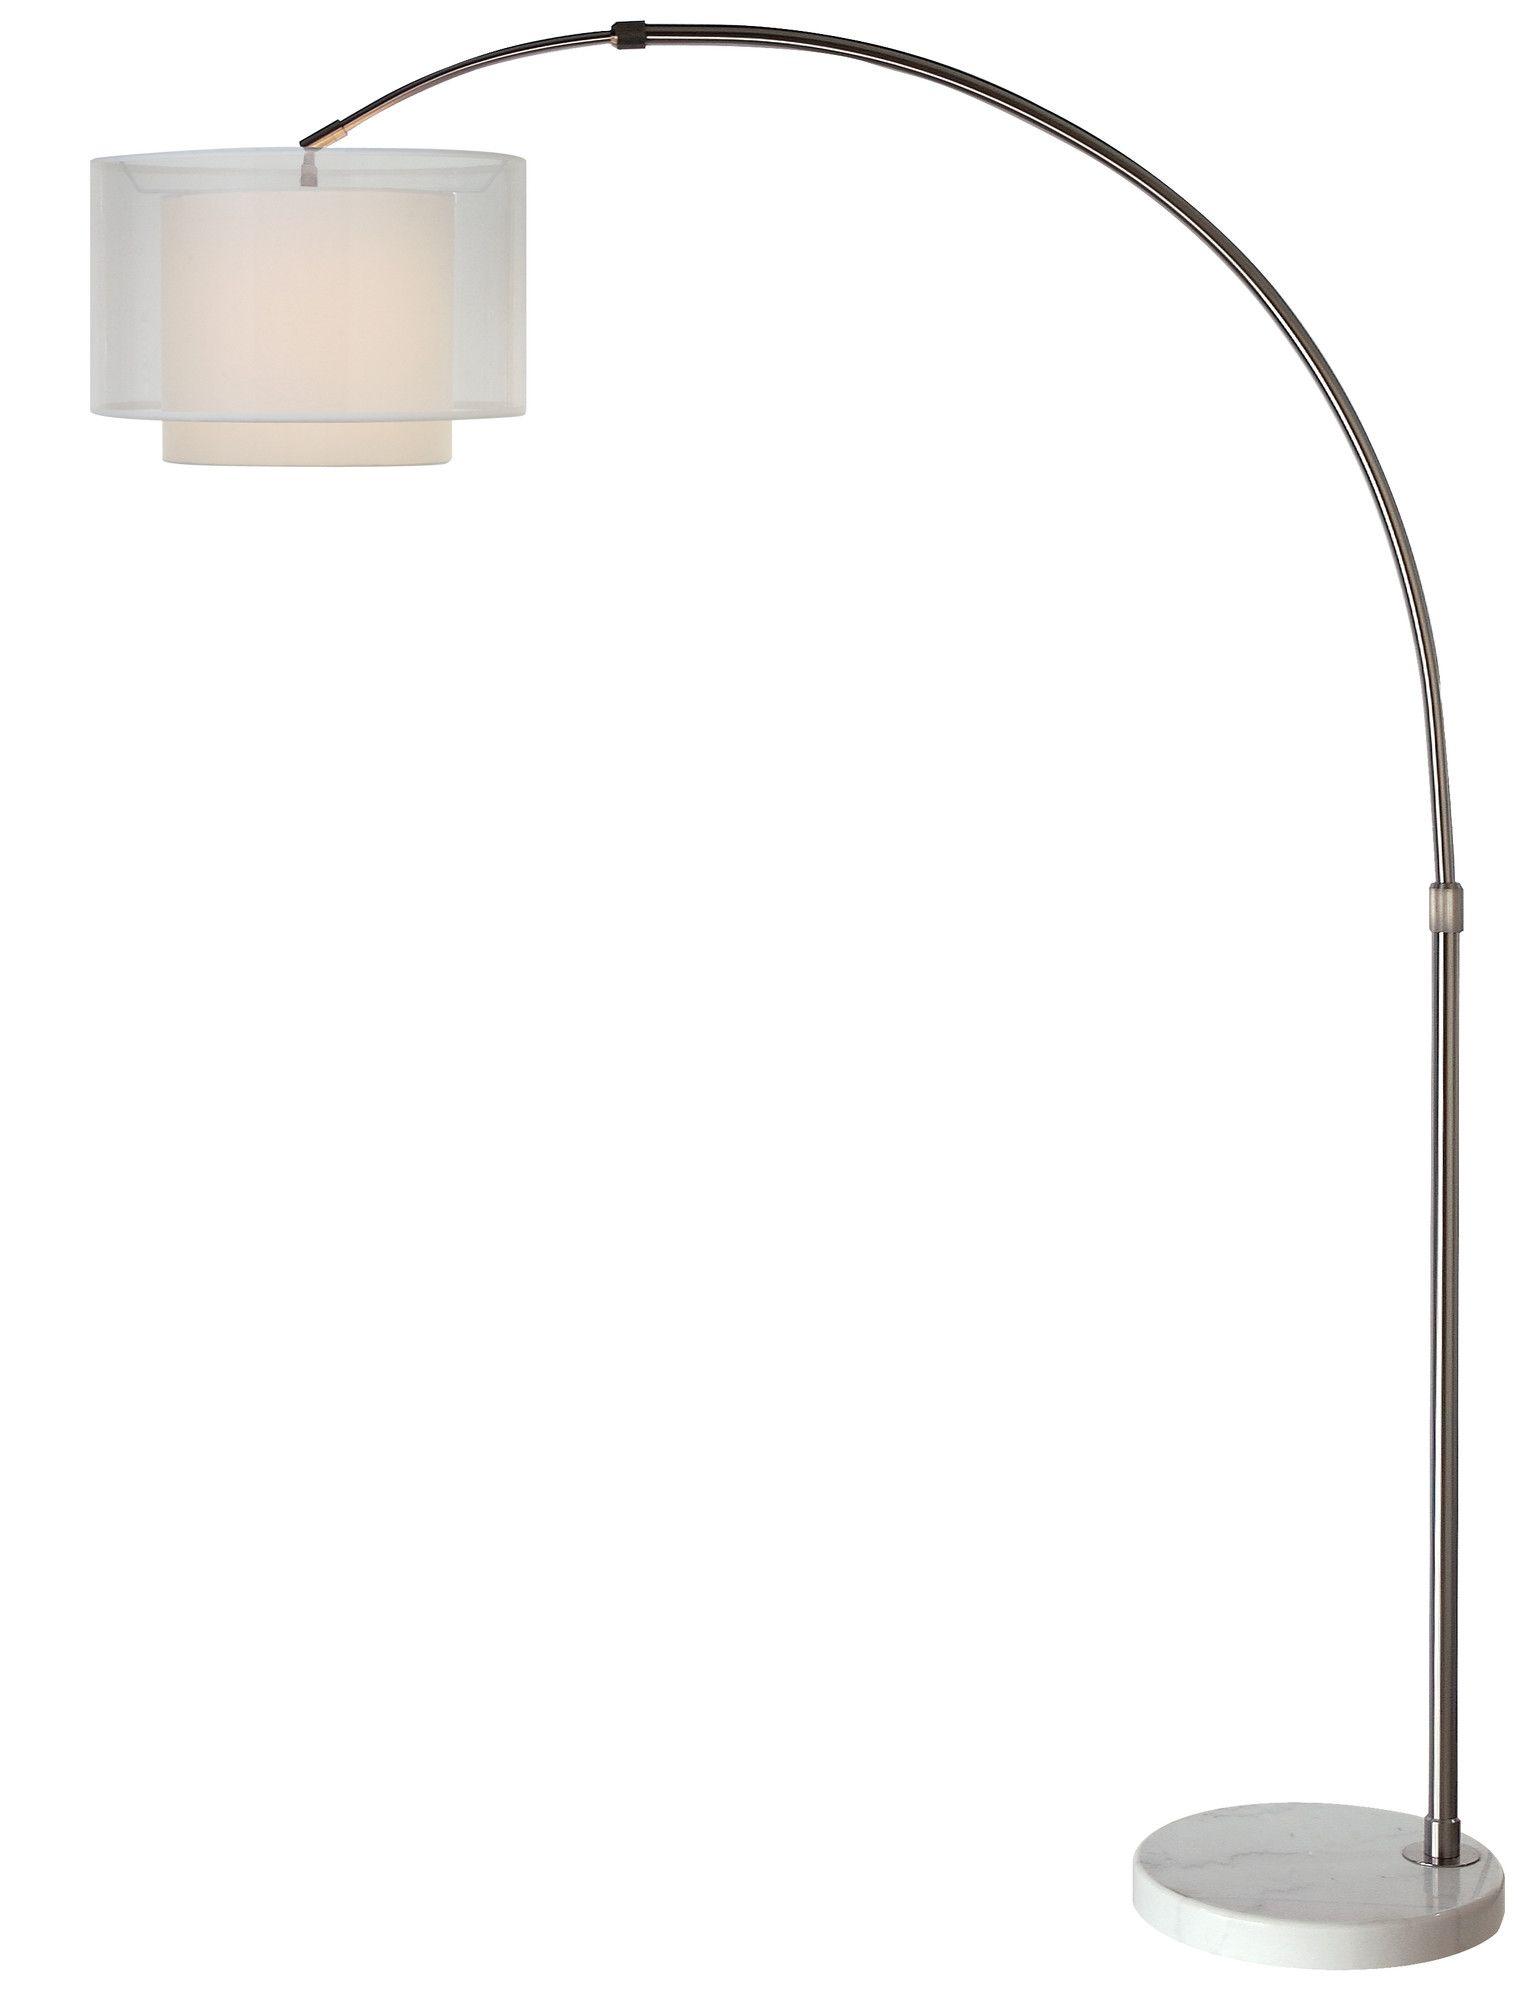 Trend Lighting Corp Brella Floor Lamp Allmodern Green